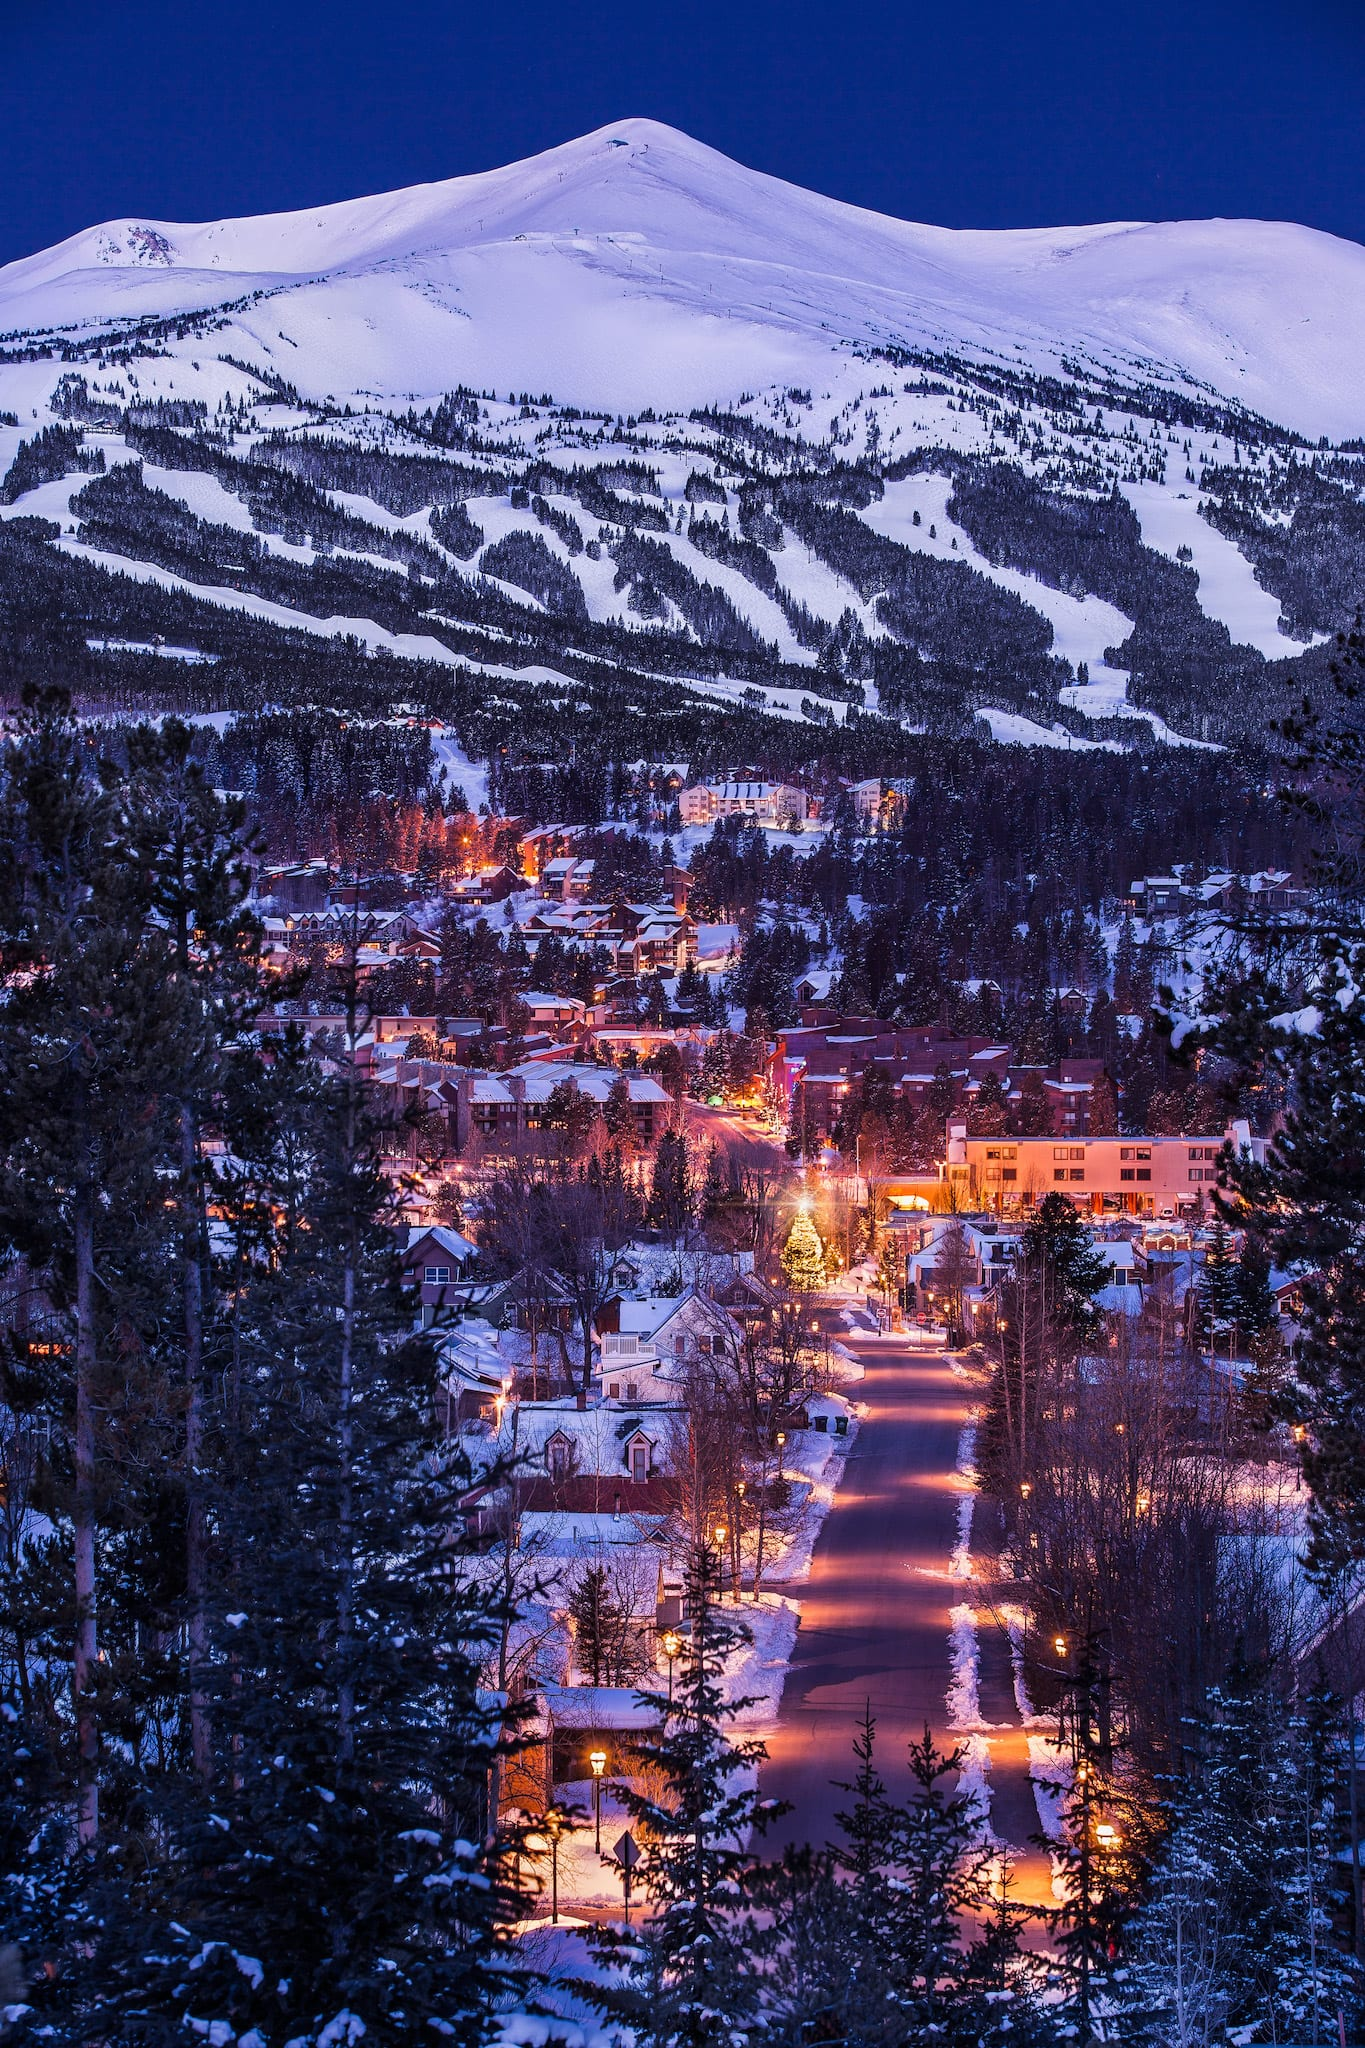 Breckenridge Ski Resort and Downtown Breck at Dawn